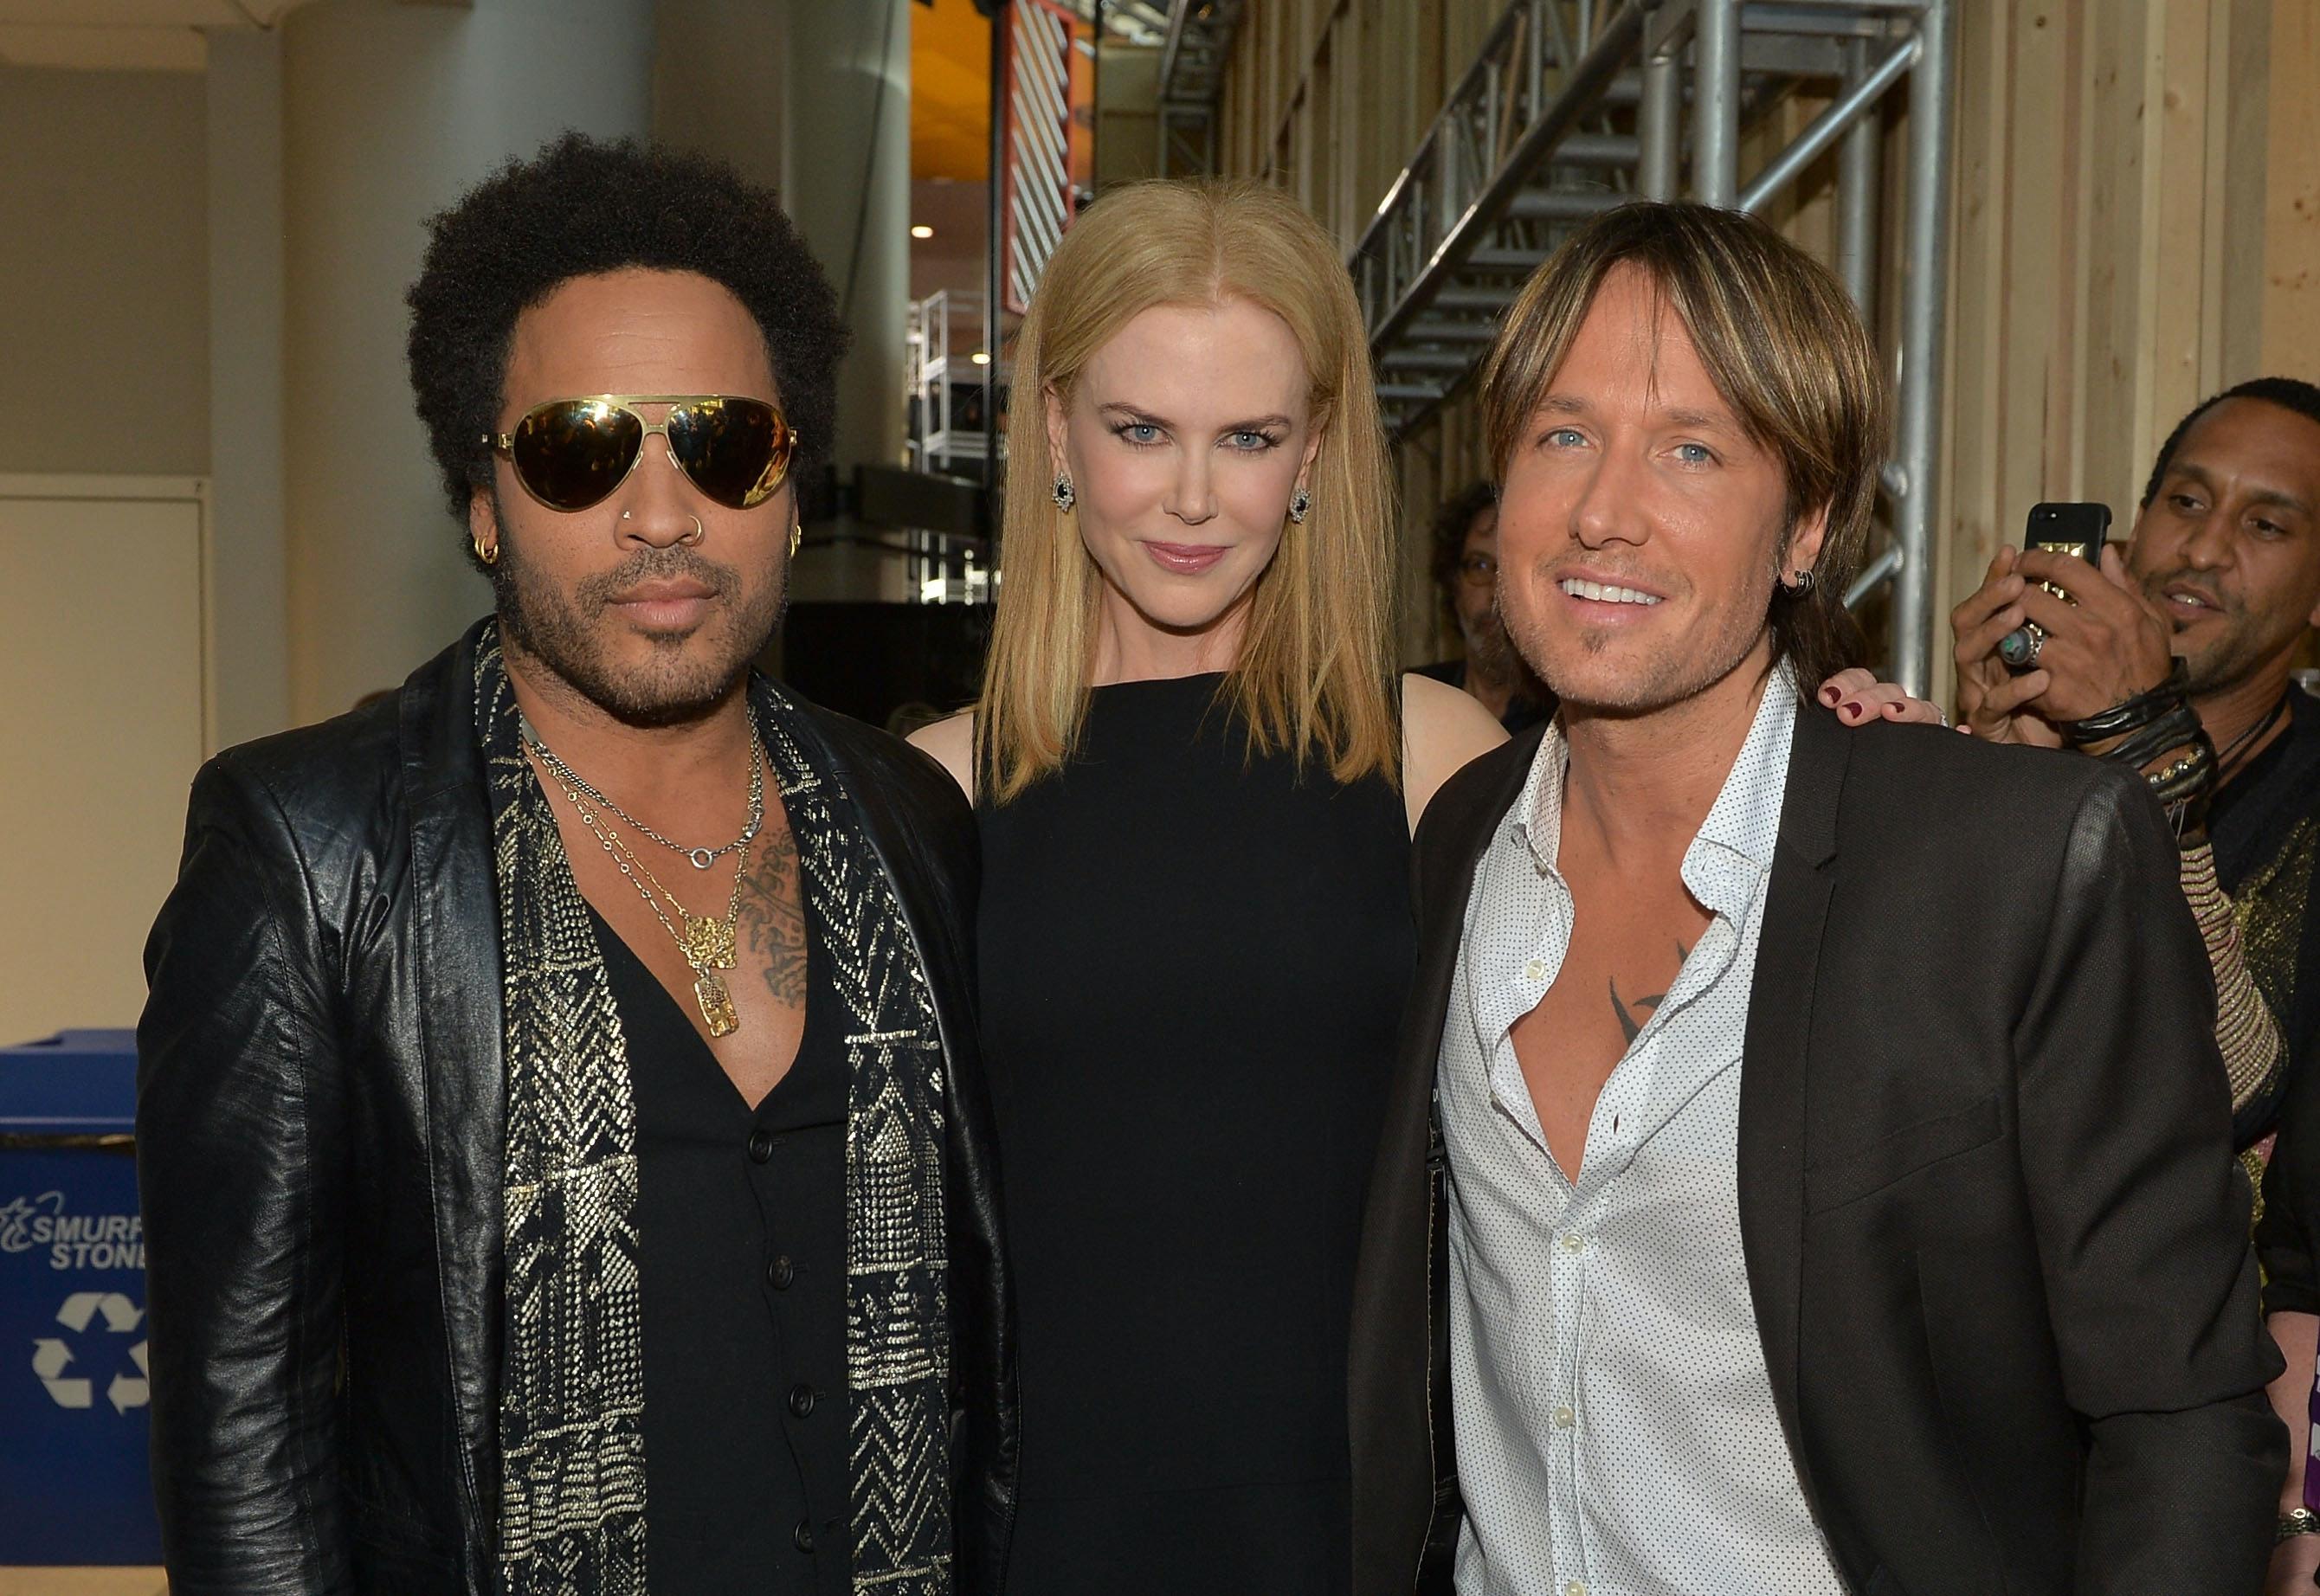 Nicole Kidman was once engaged to Lenny Kravitz